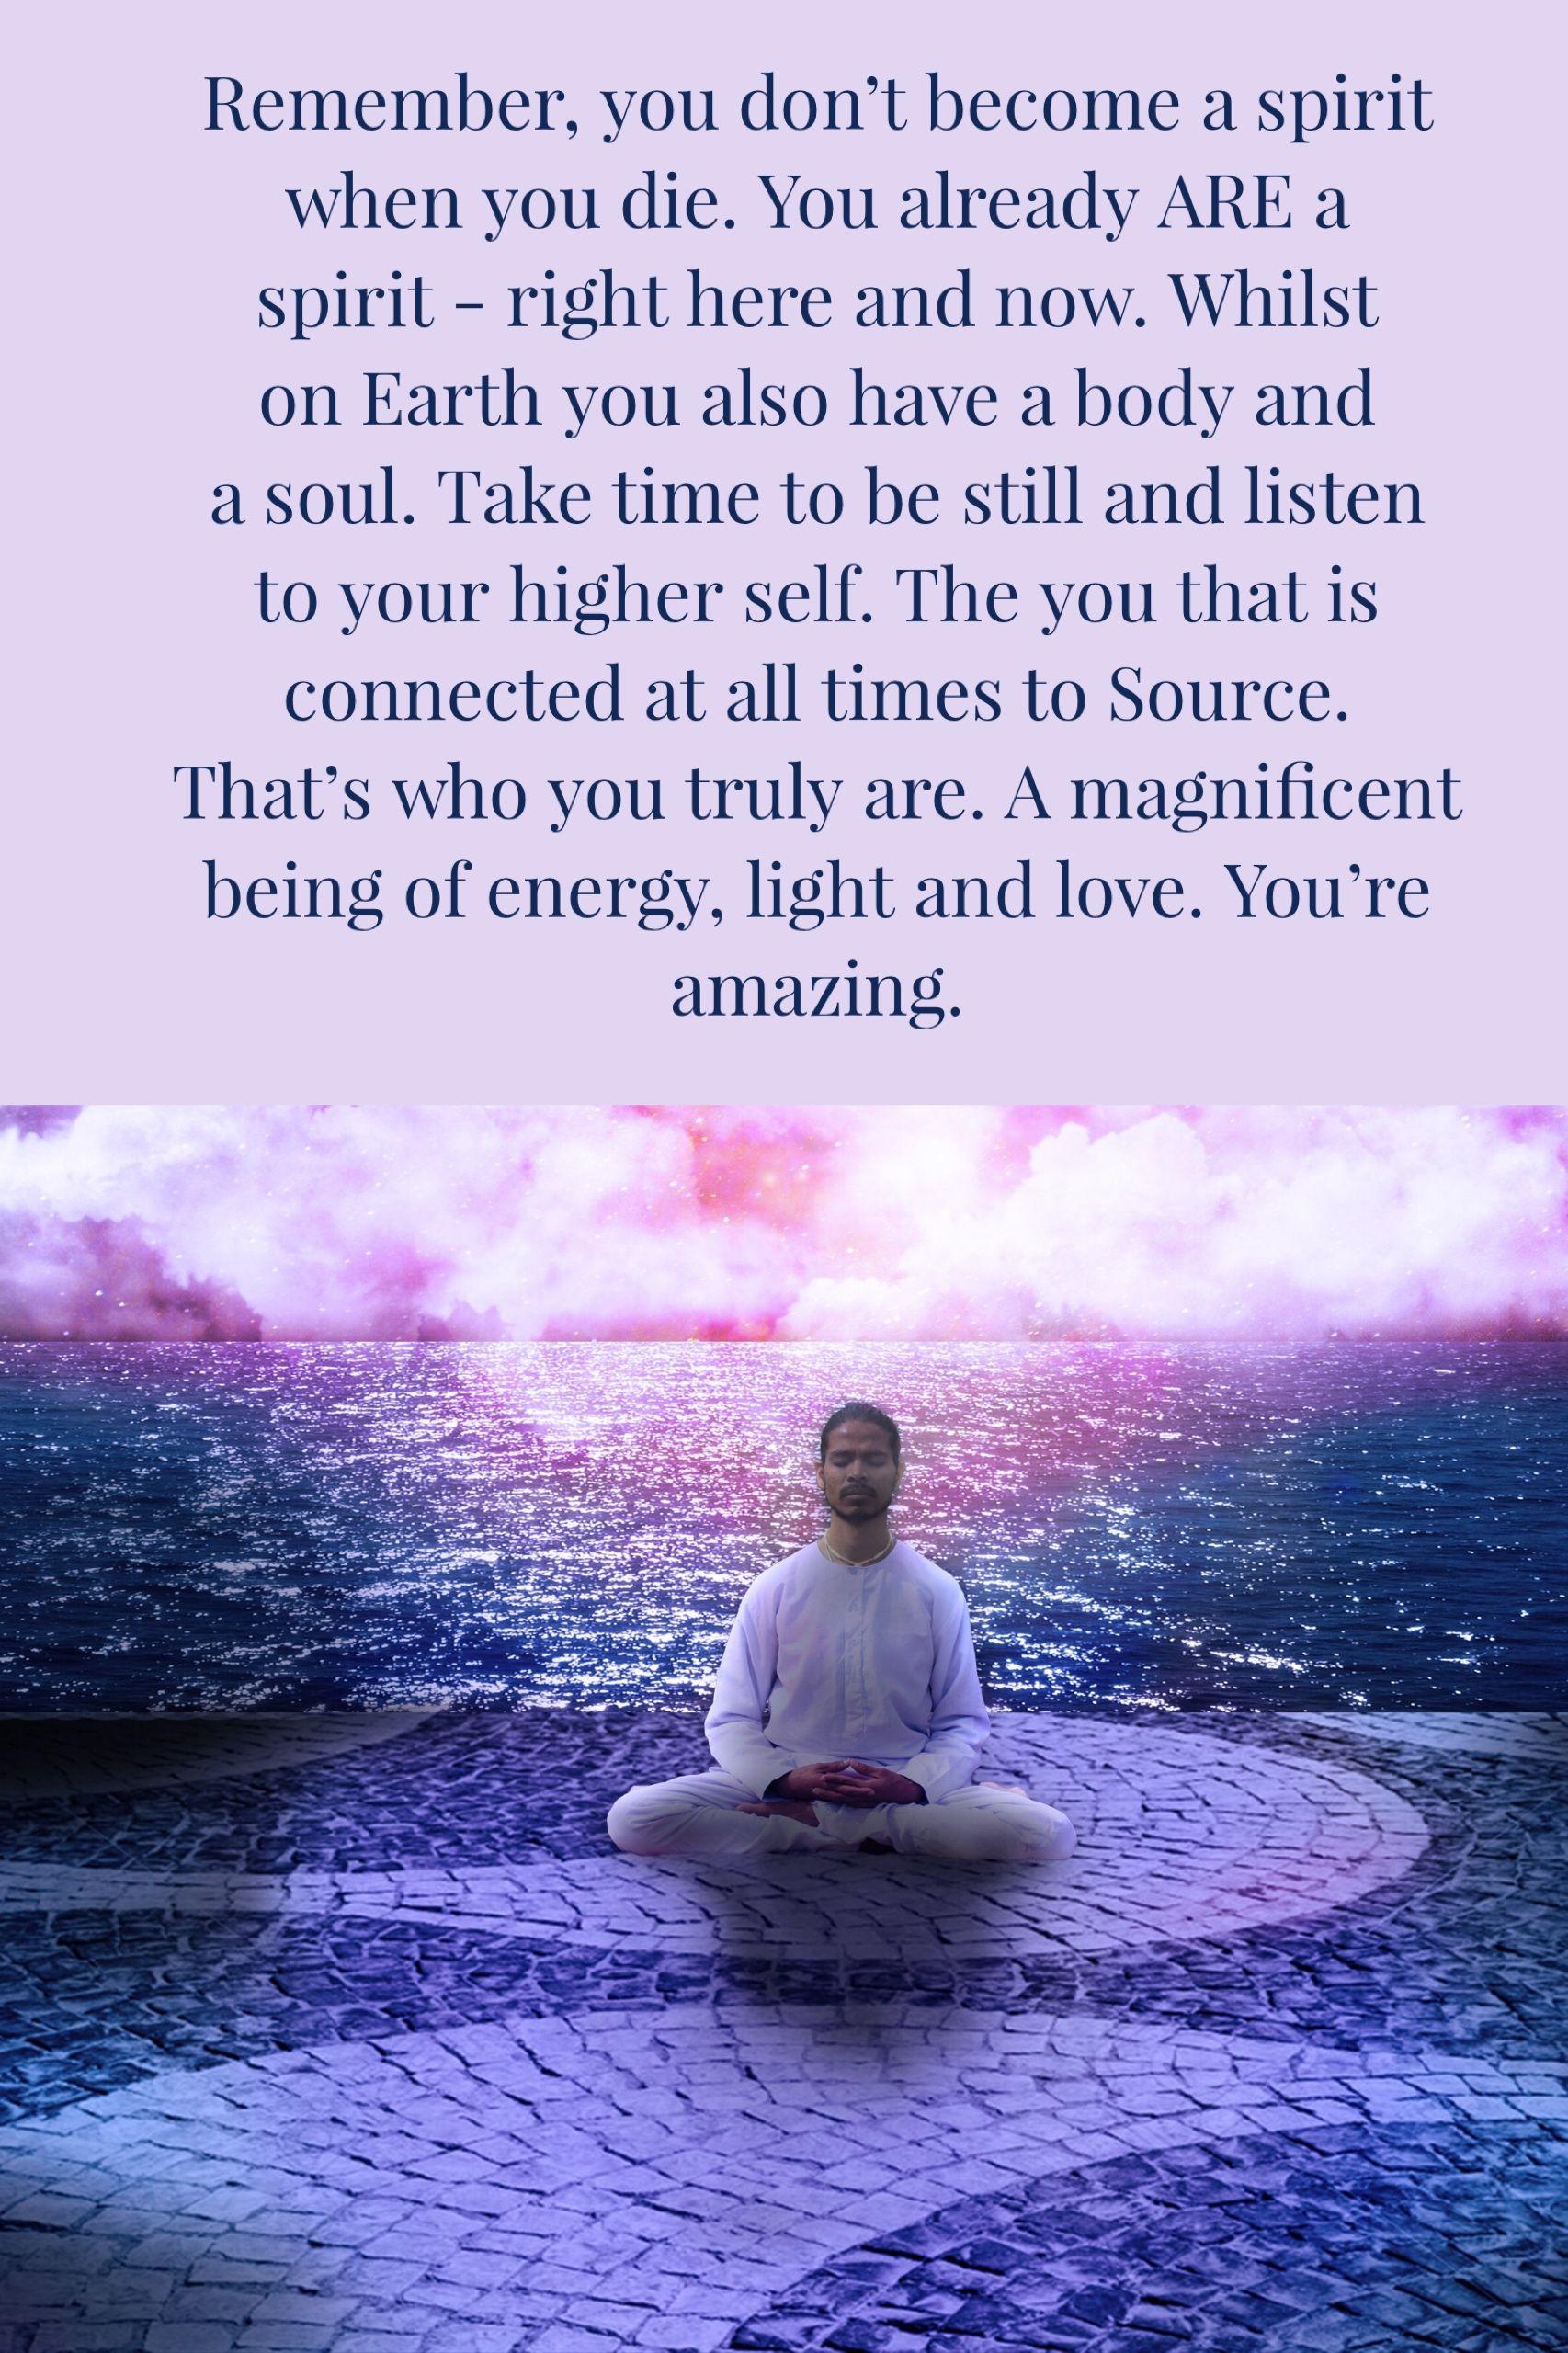 8335768767b9098c446ab6c8b7d82f1e - How To Get In Touch With My Spiritual Self